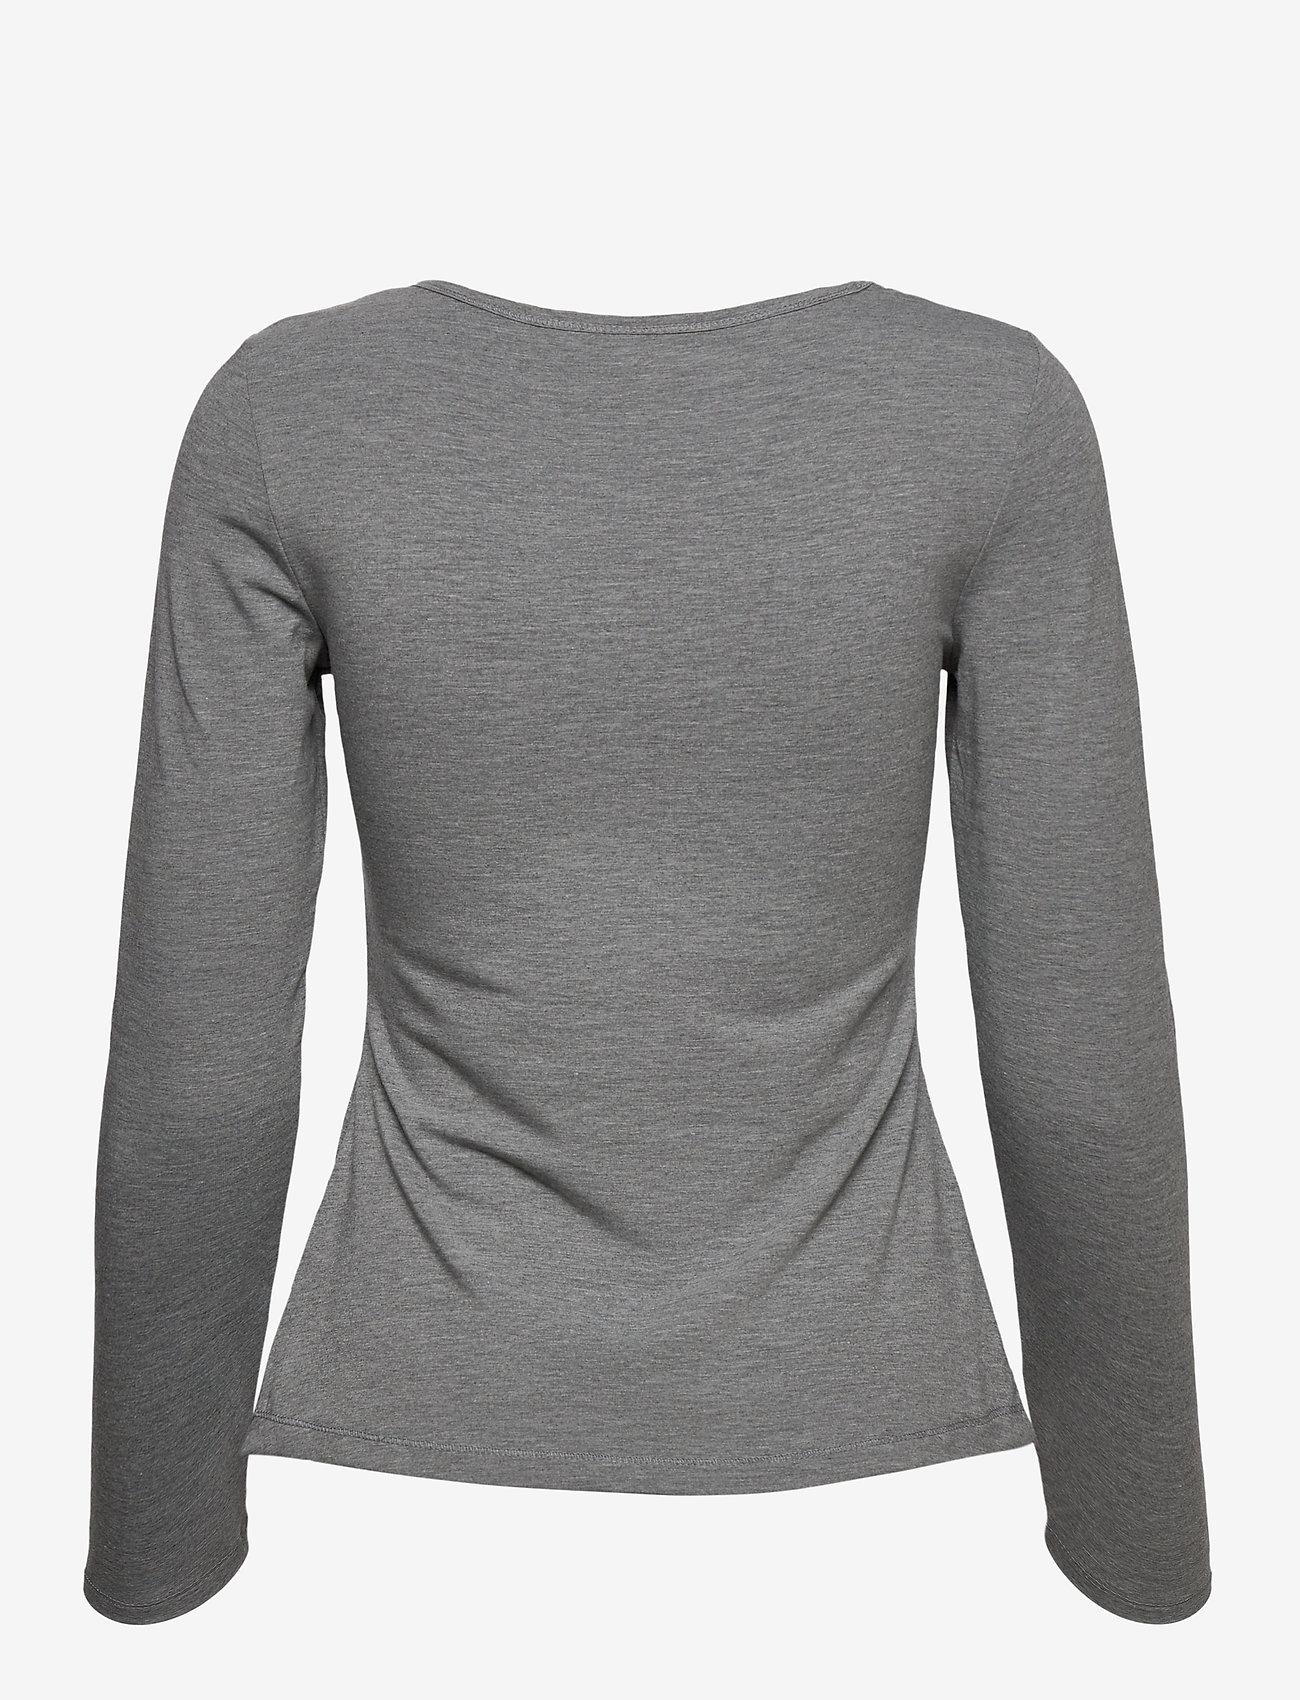 Fransa - Kasic 1 Tshirt - pitkähihaiset t-paidat - asphalt melange - 1